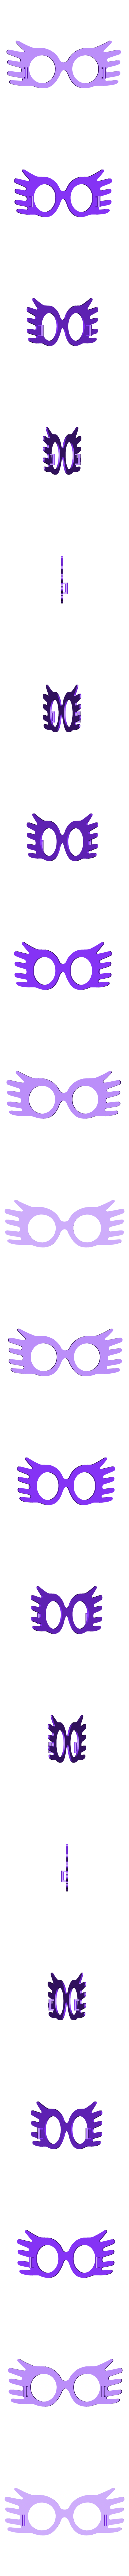 luna_lovegood_glasses_frame.stl Download free STL file Luna Lovegood SpectreSpecs • 3D printer template, mark579